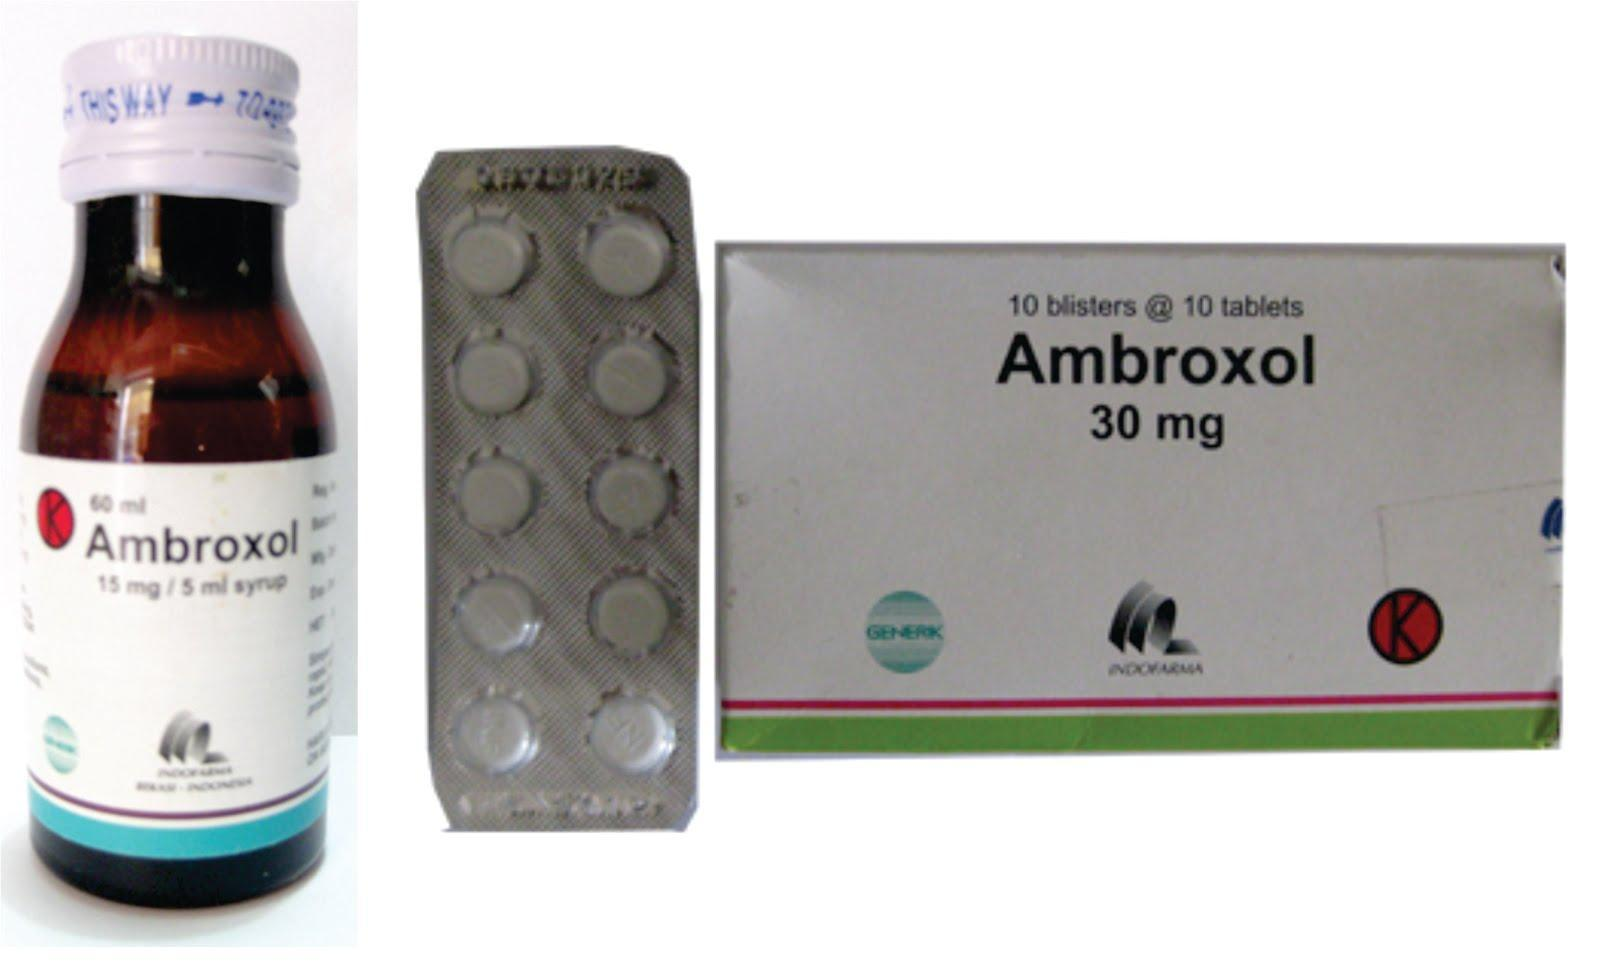 Ambroxol (Oral)